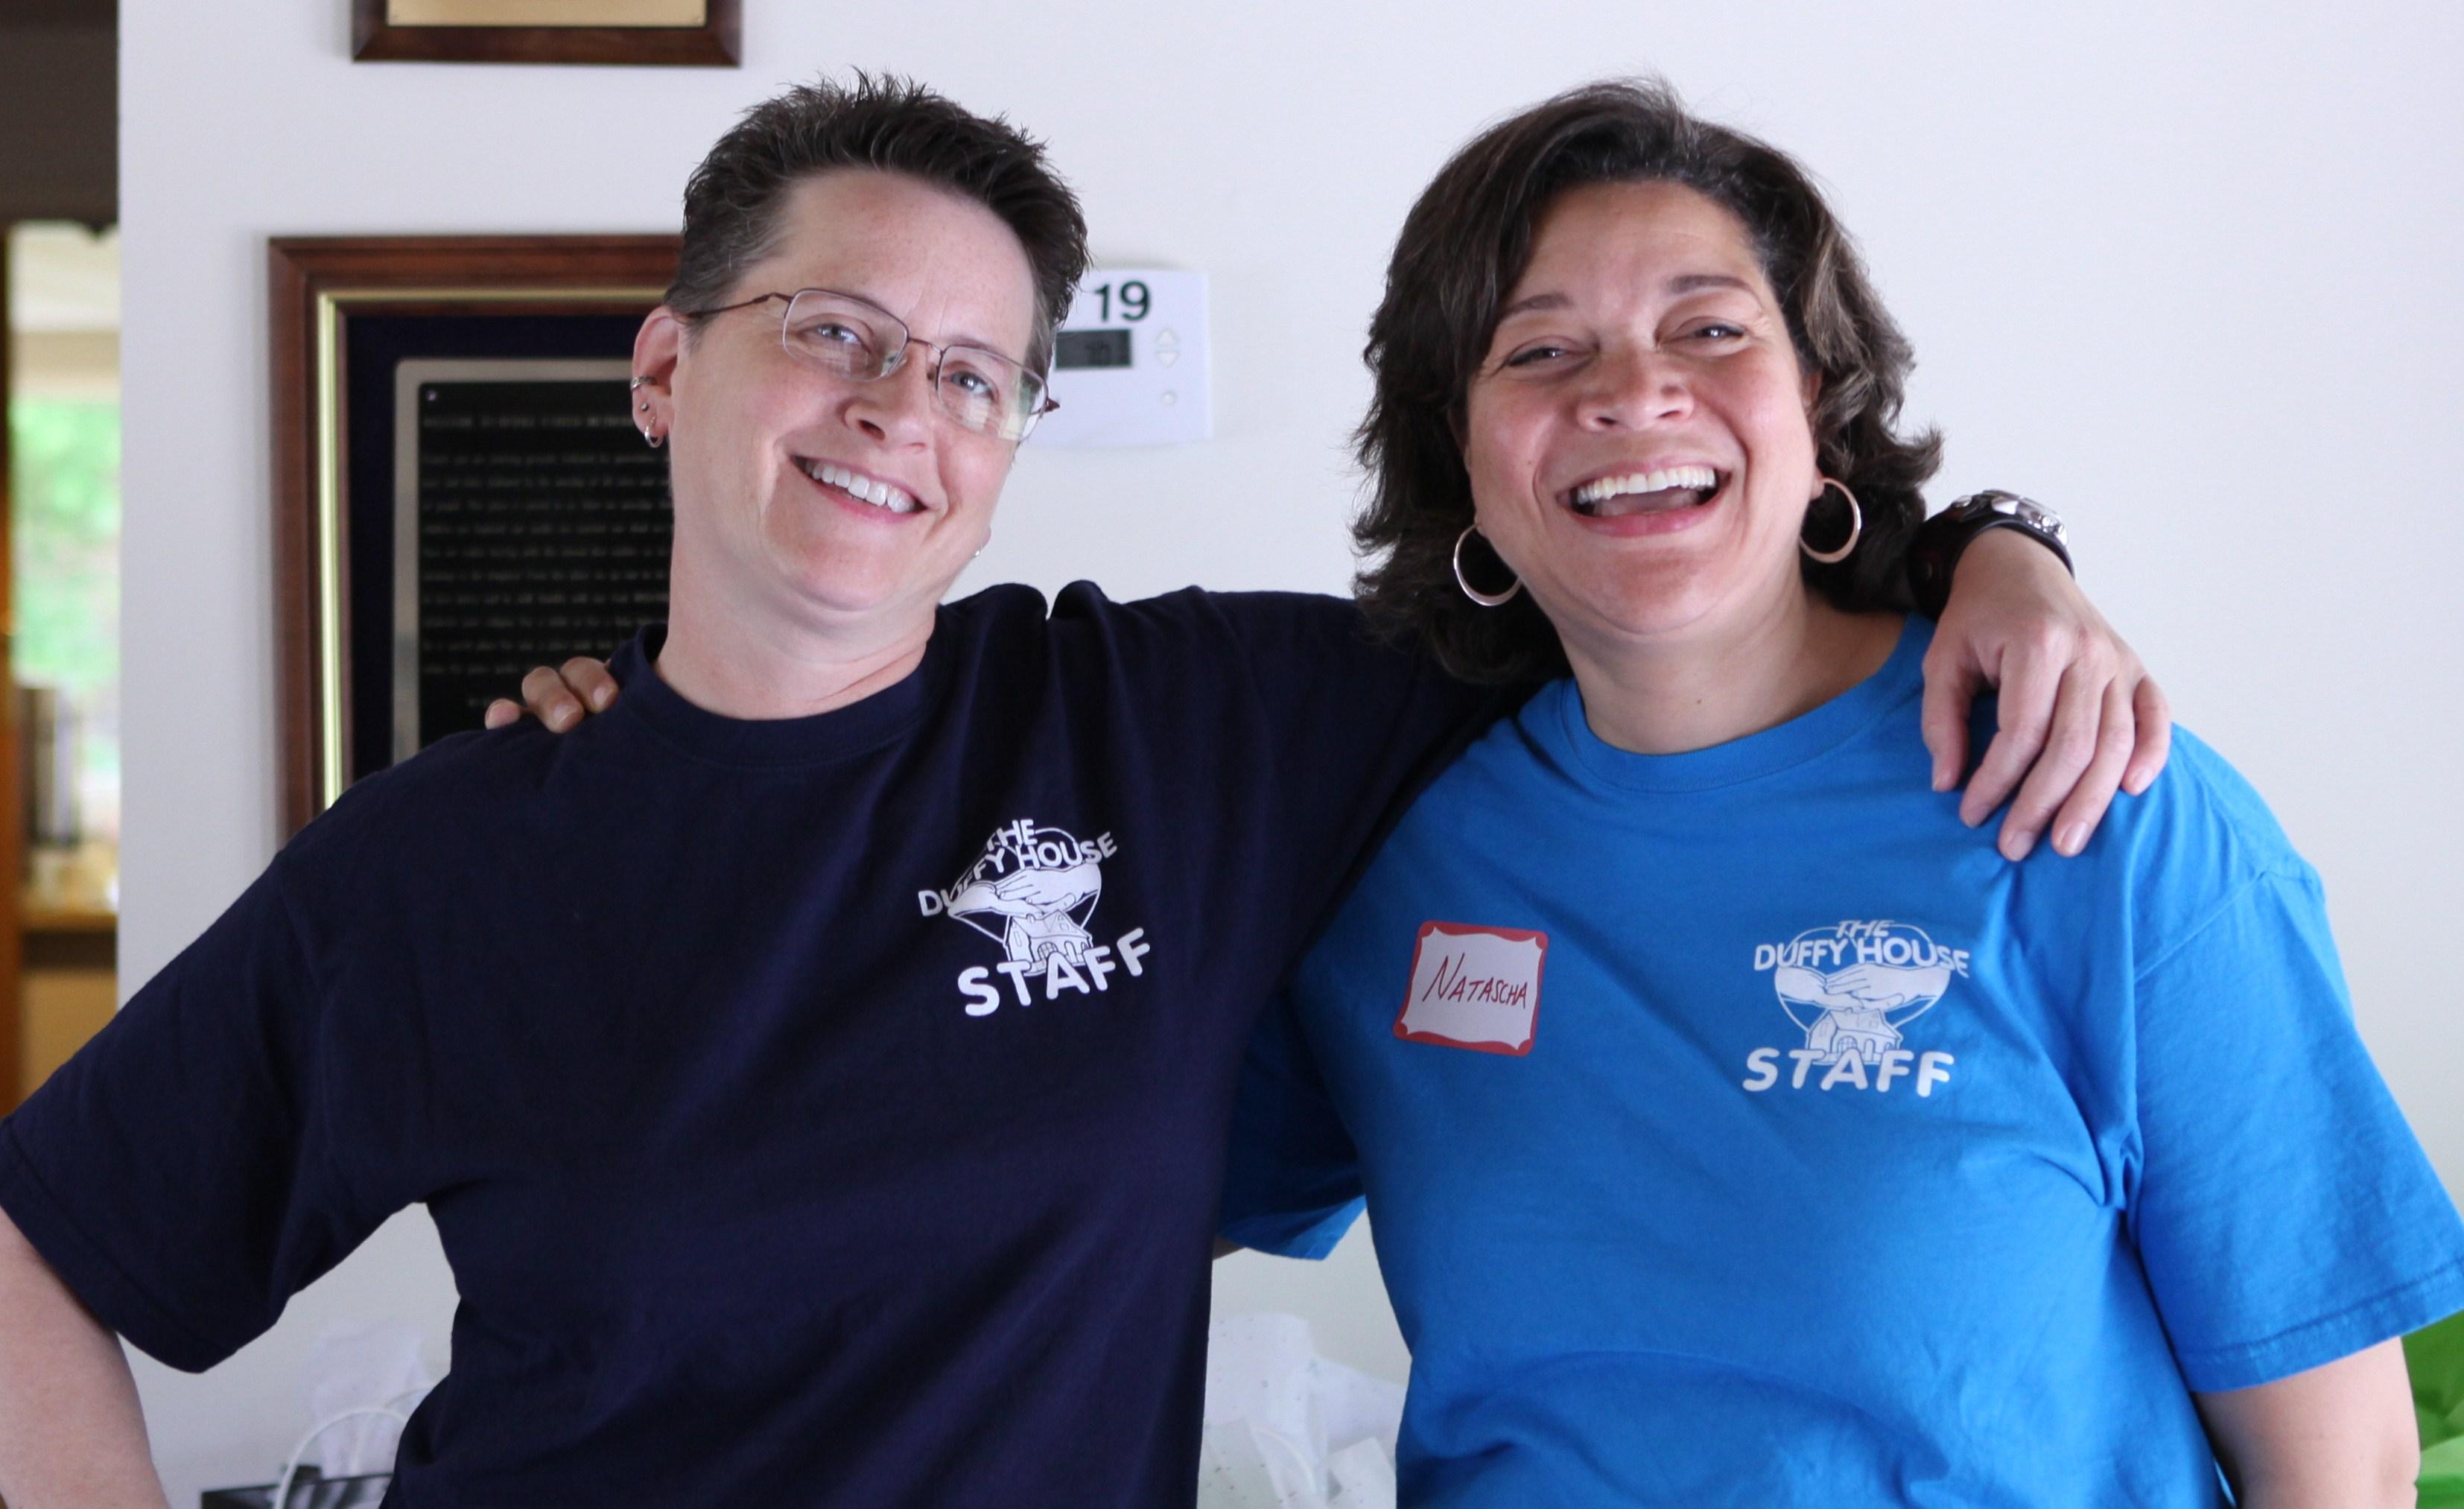 2012-07-02-VolunteersRandiMillerandNataschaDixonhappytohandoutgiftbagstosurvivorsastheyleave.jpg